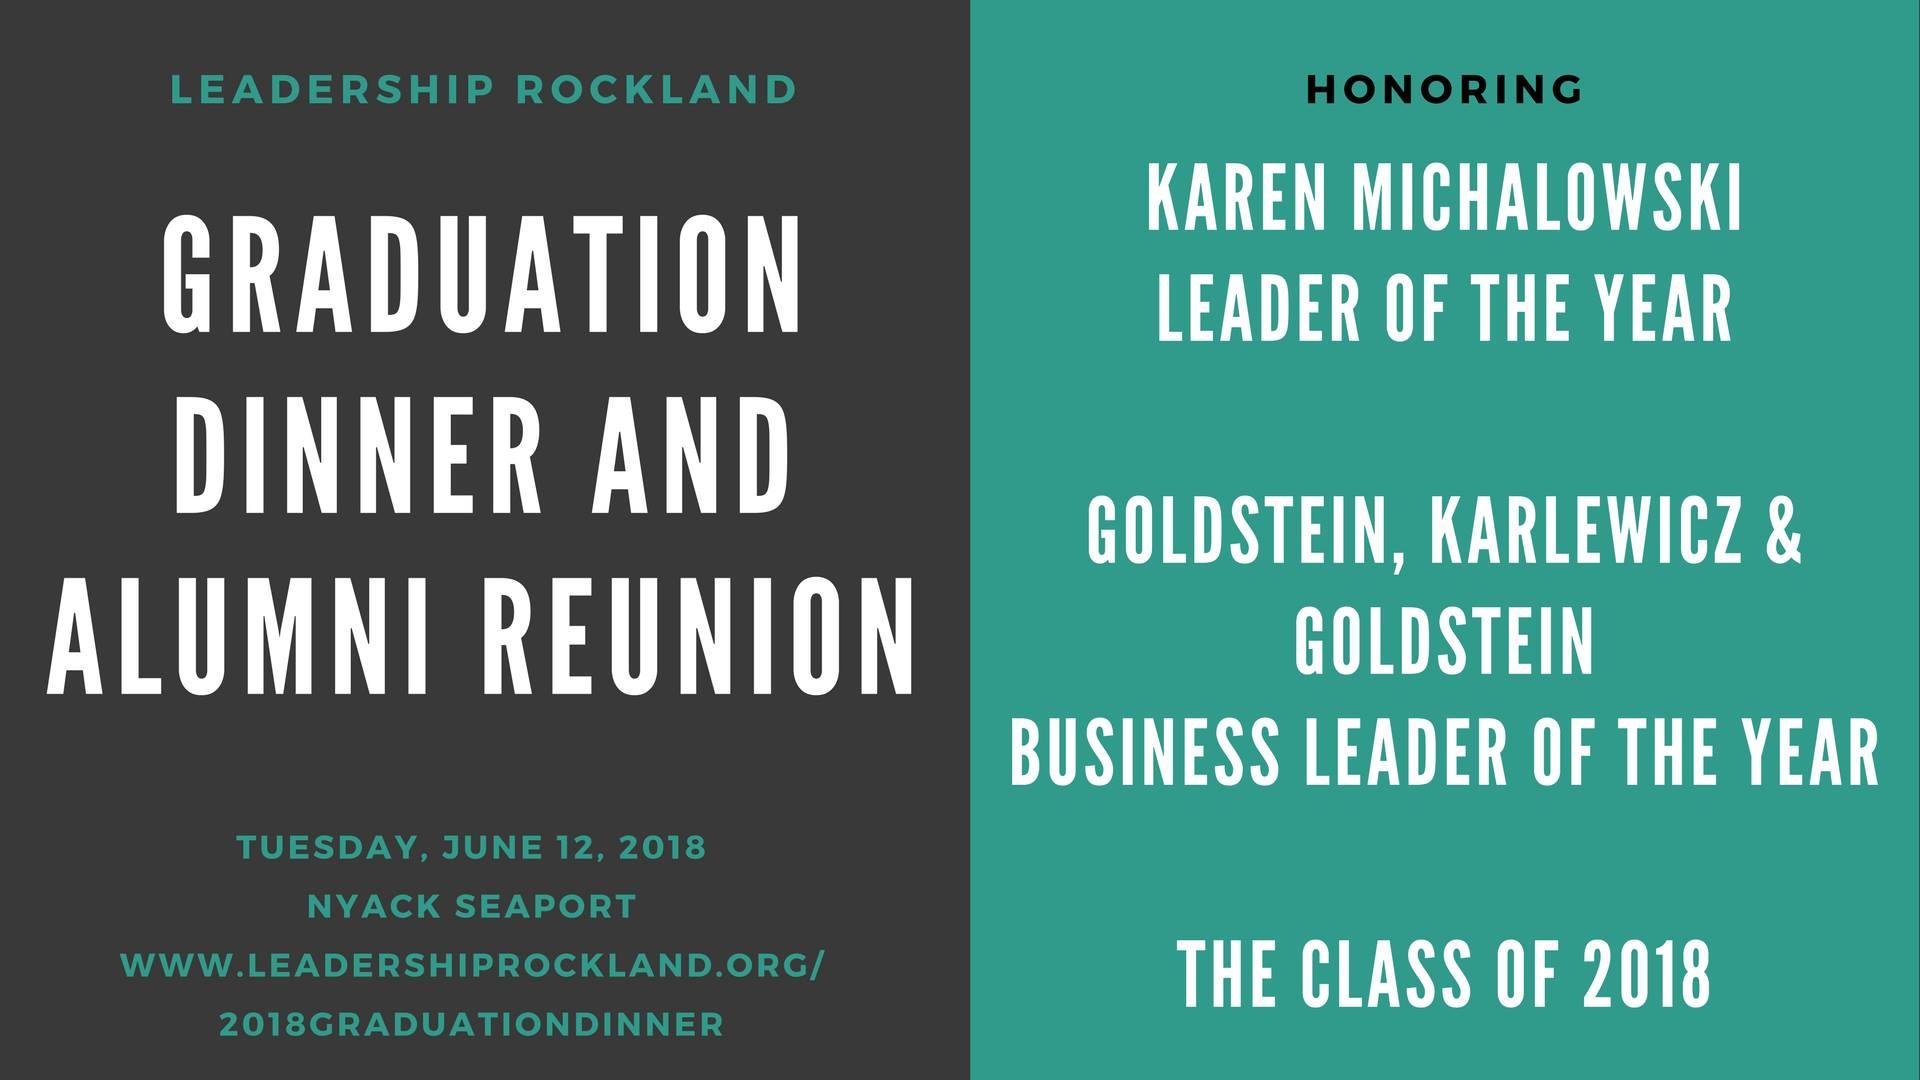 2018 Graduation Dinner and Alumni Reunion